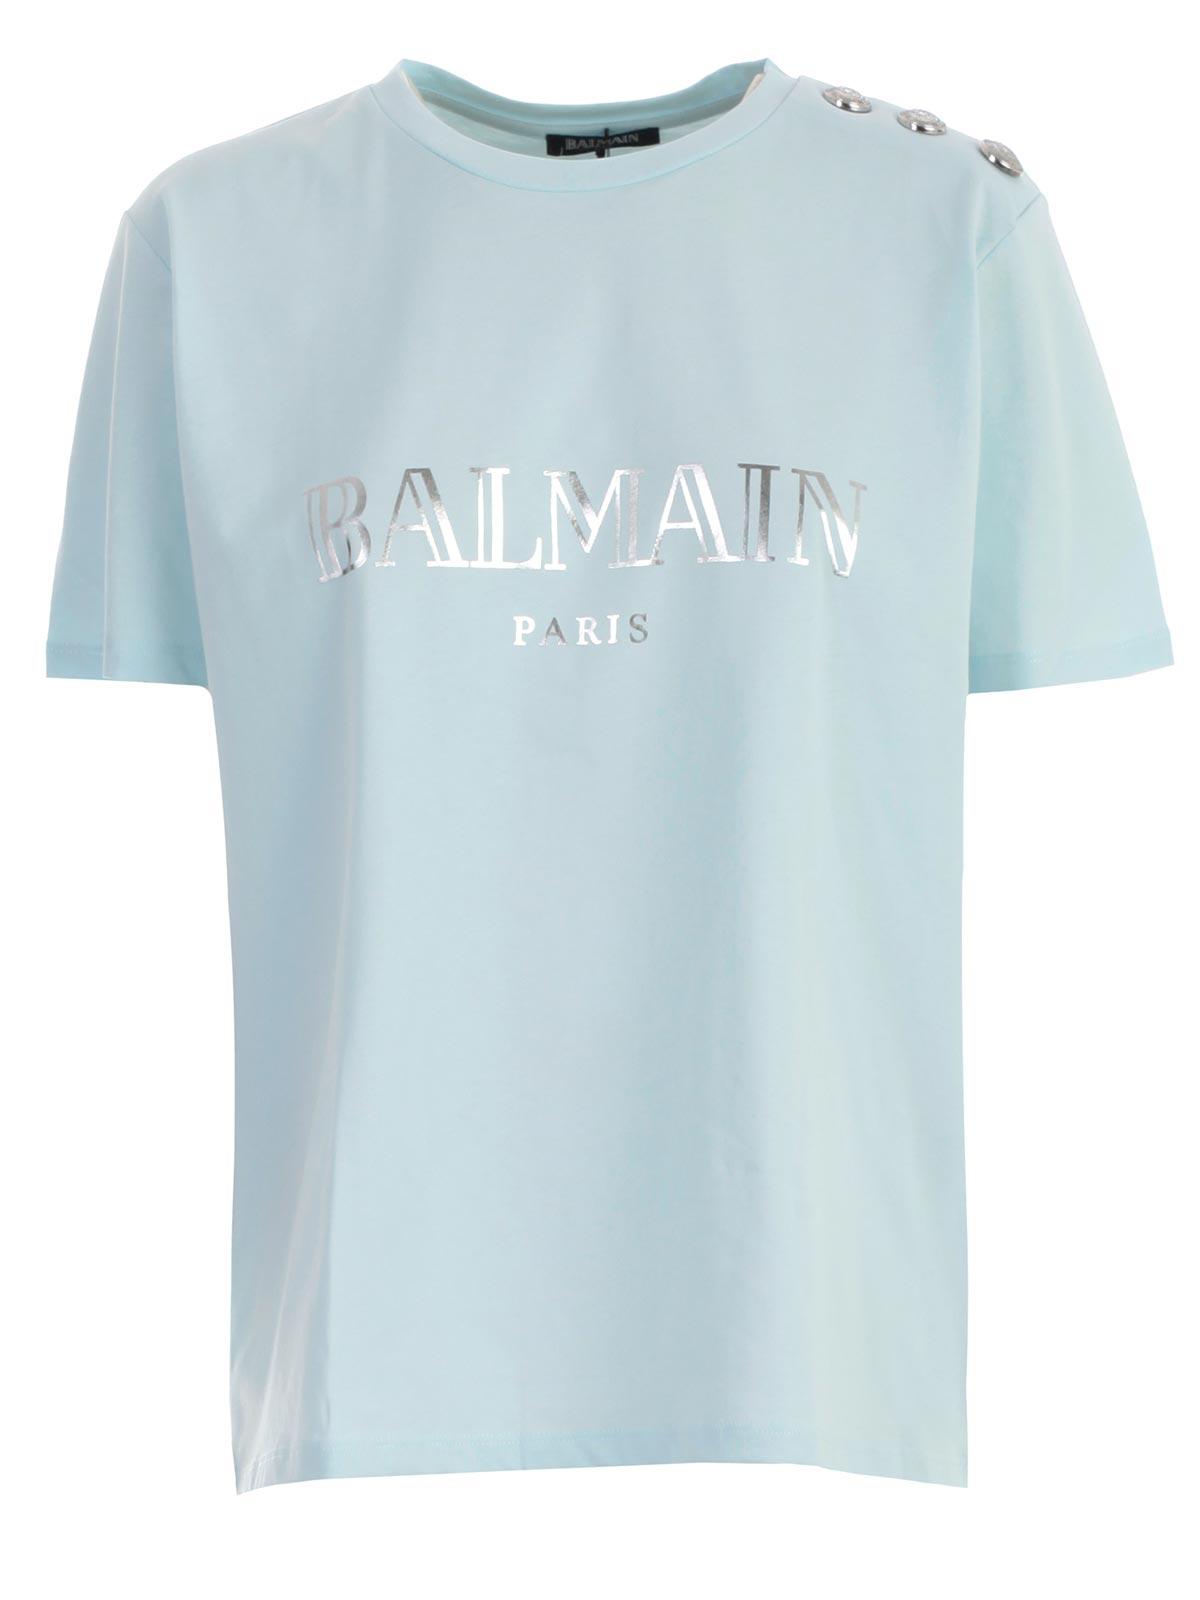 balmain t shirt dress